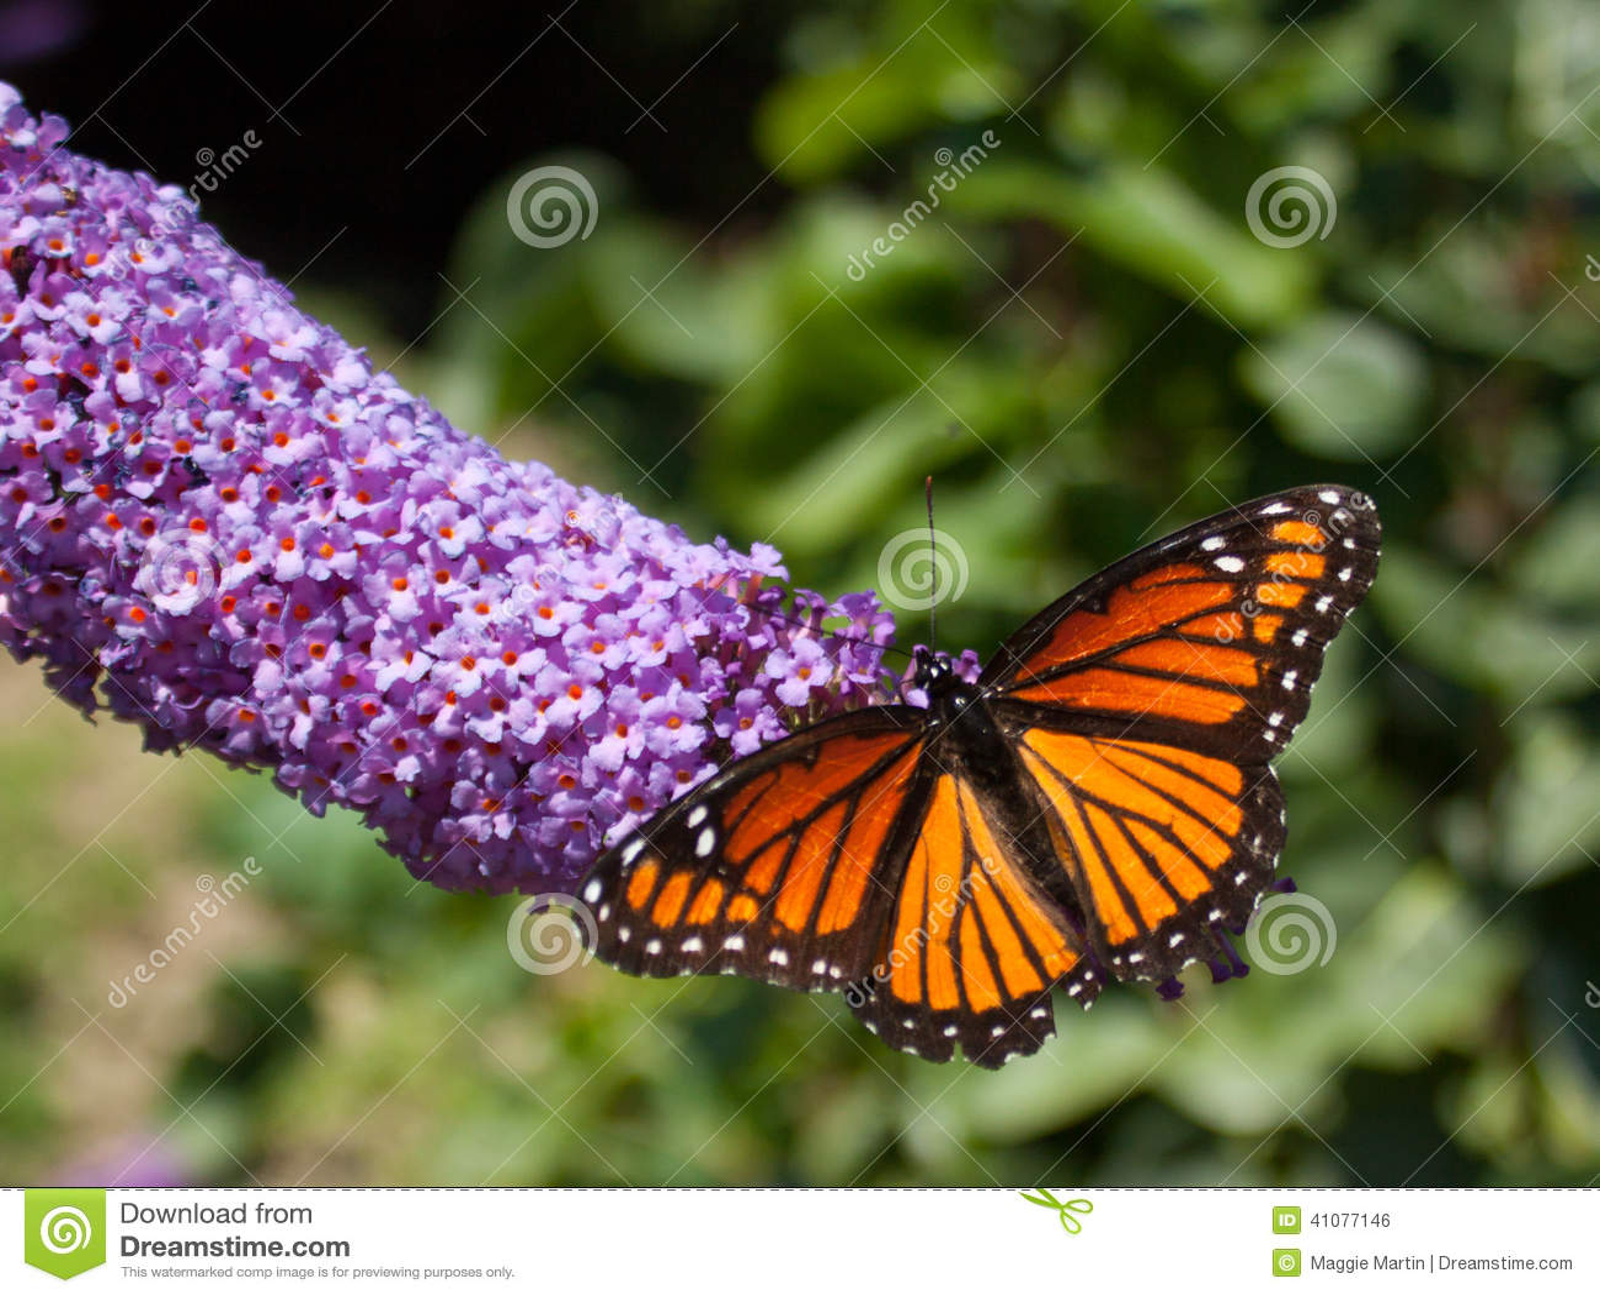 Monarch Butterfly Landscape Stock Photo Image 41077146